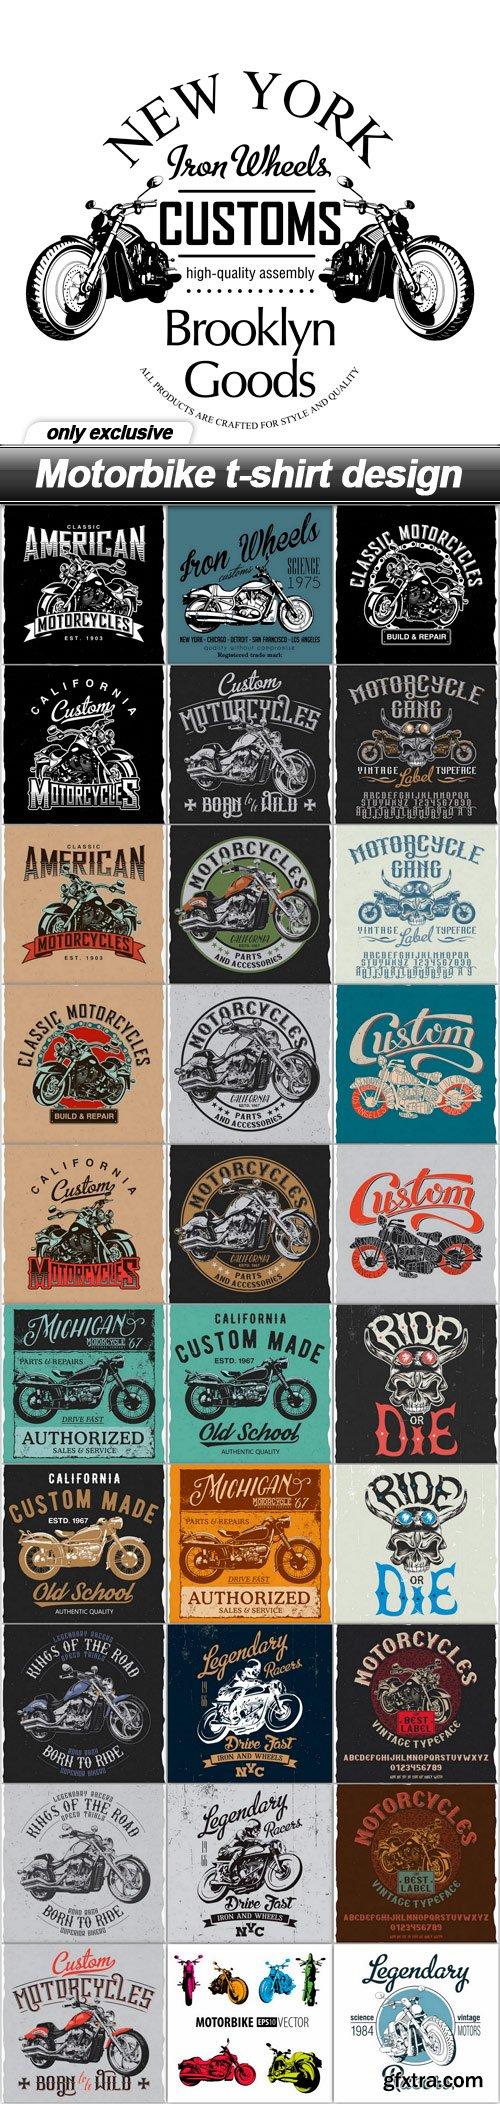 Motorbike t-shirt design - 31 EPS